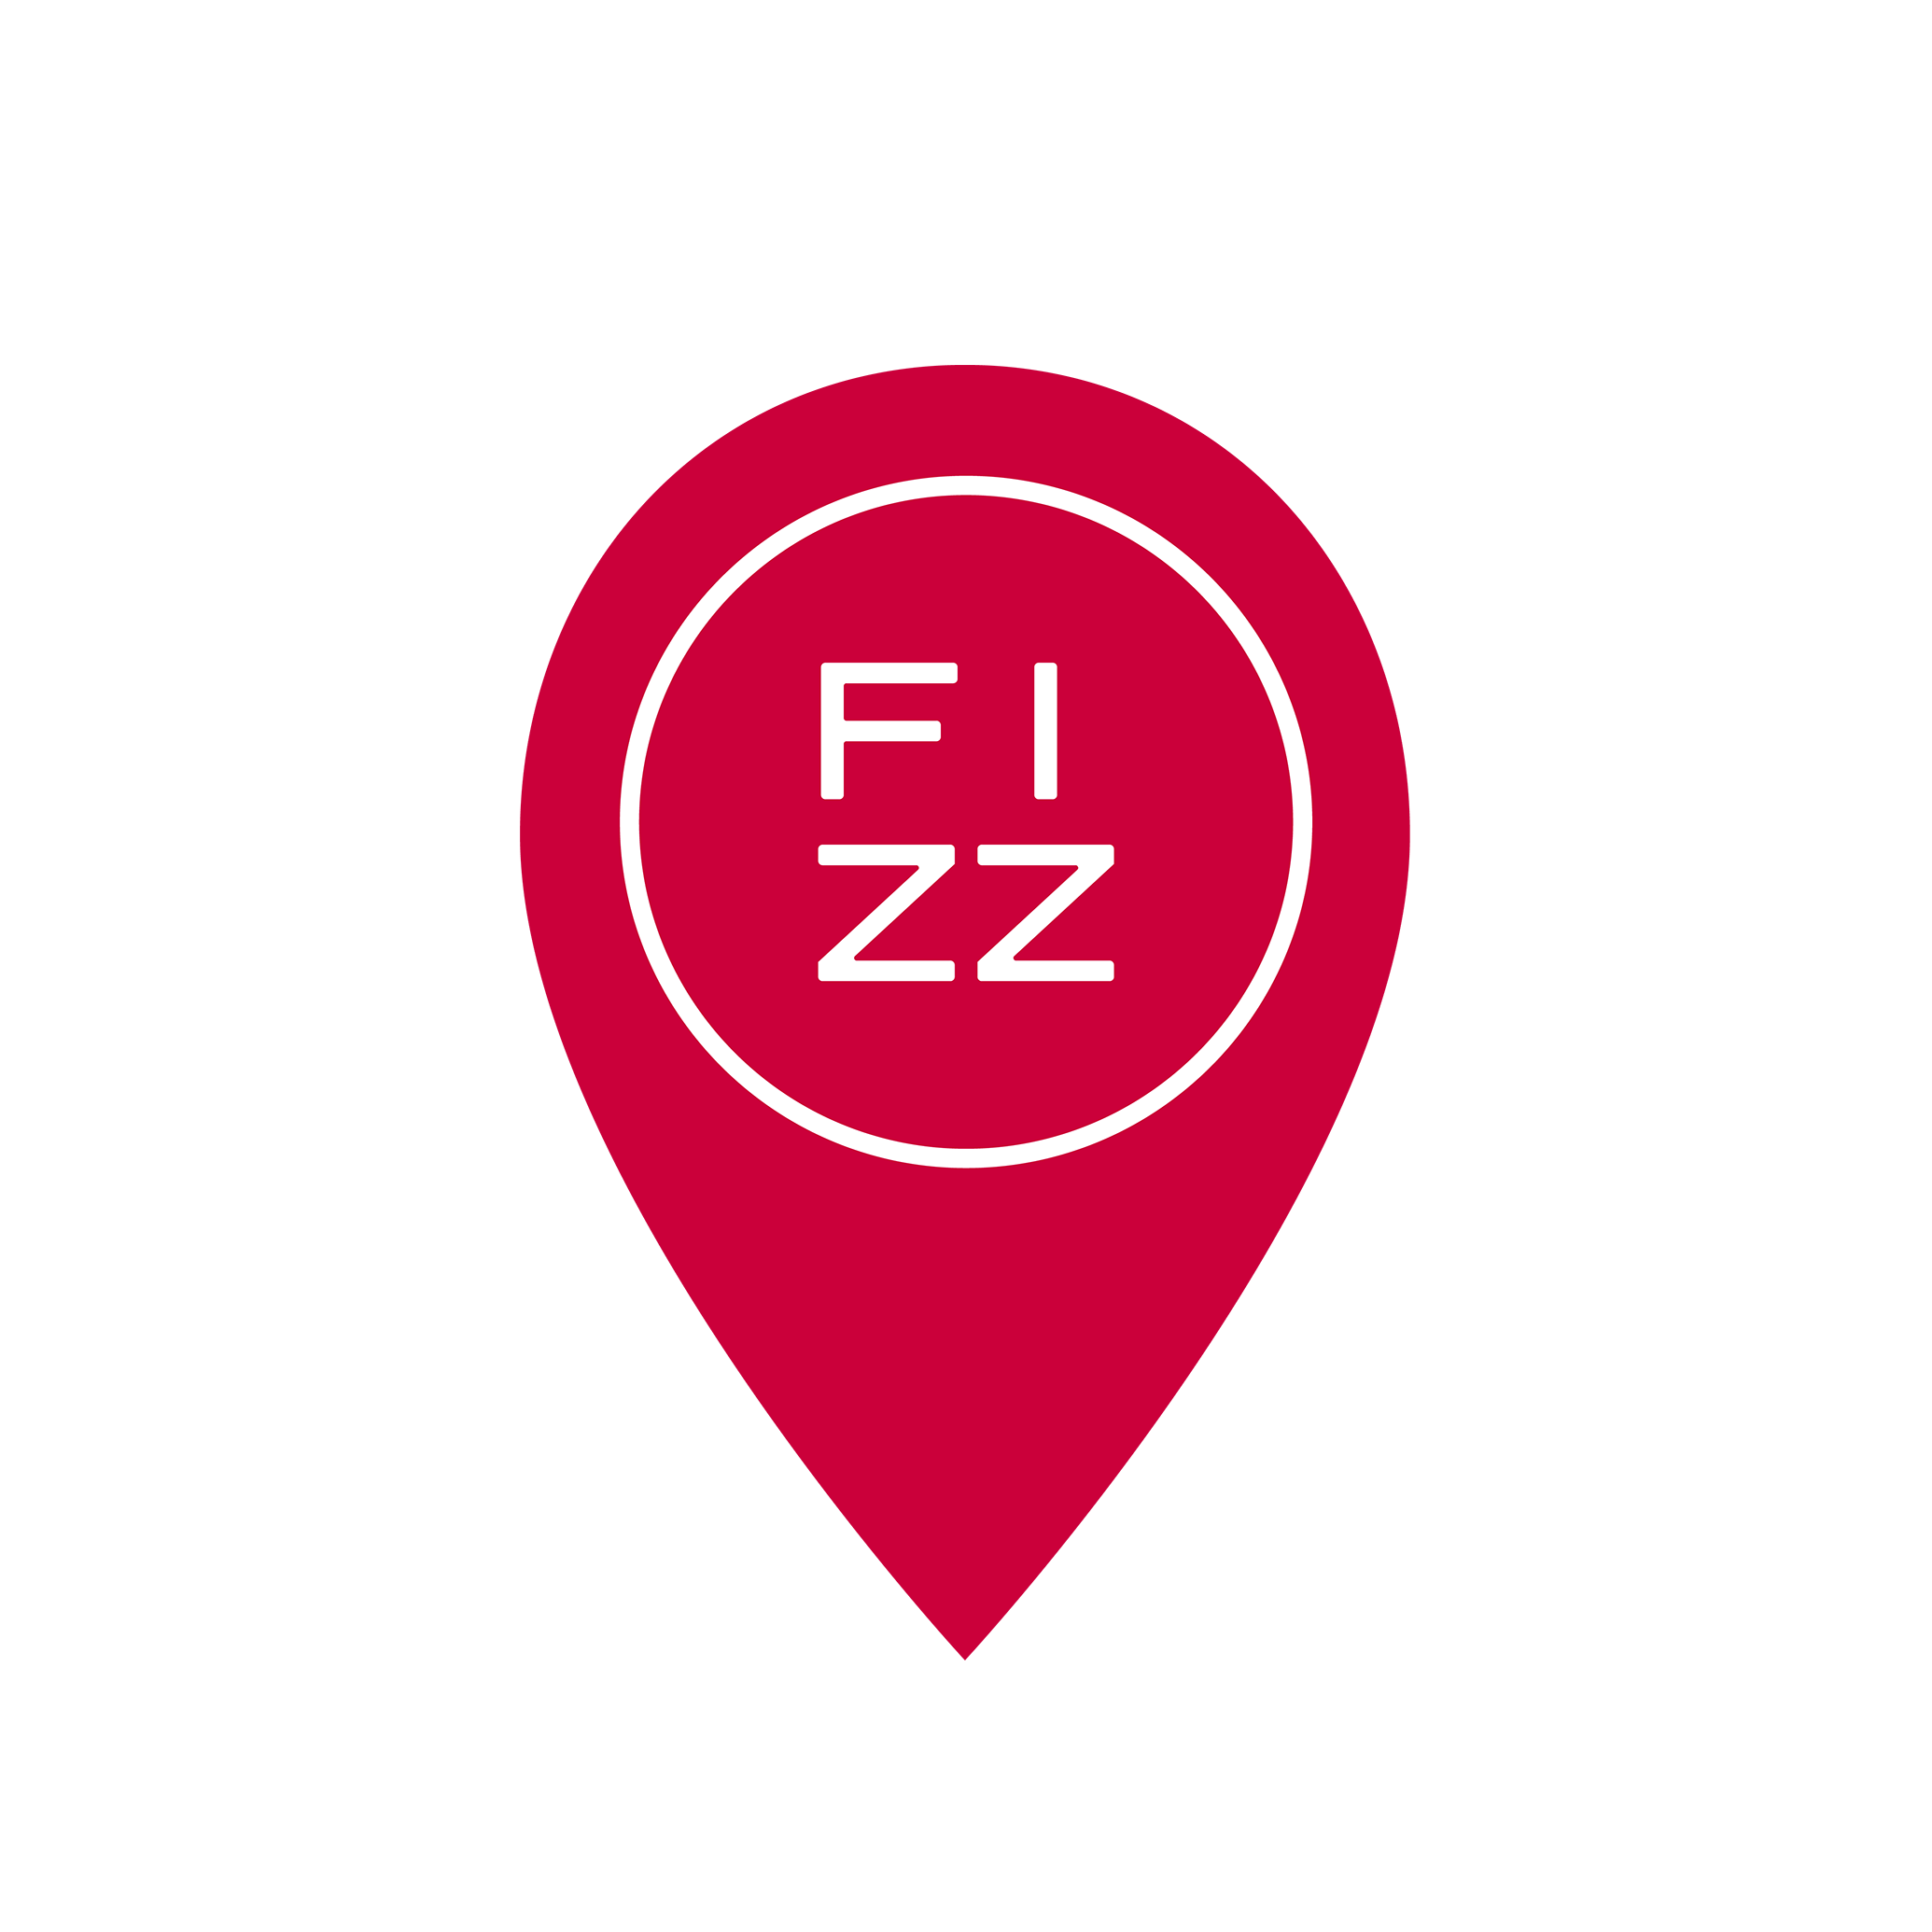 Home thefizz pointer